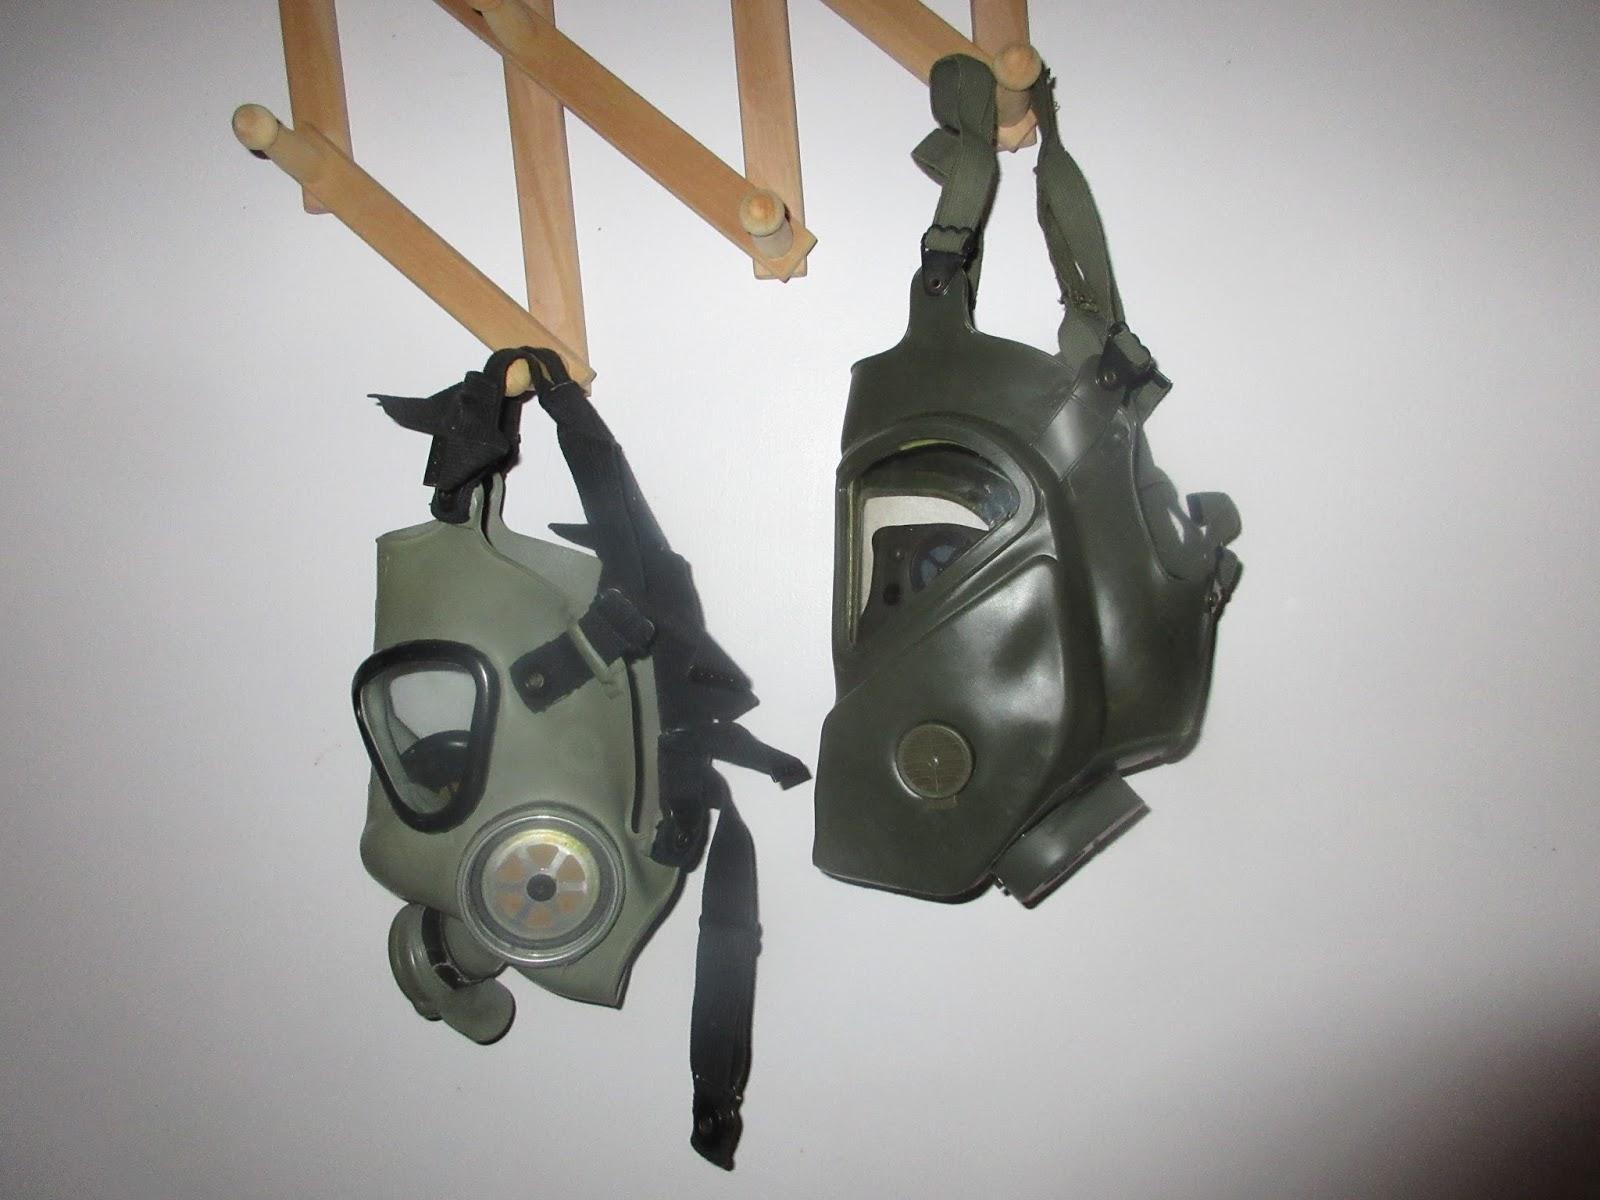 Gasmask collection for the day: USXM28E4 gasmask